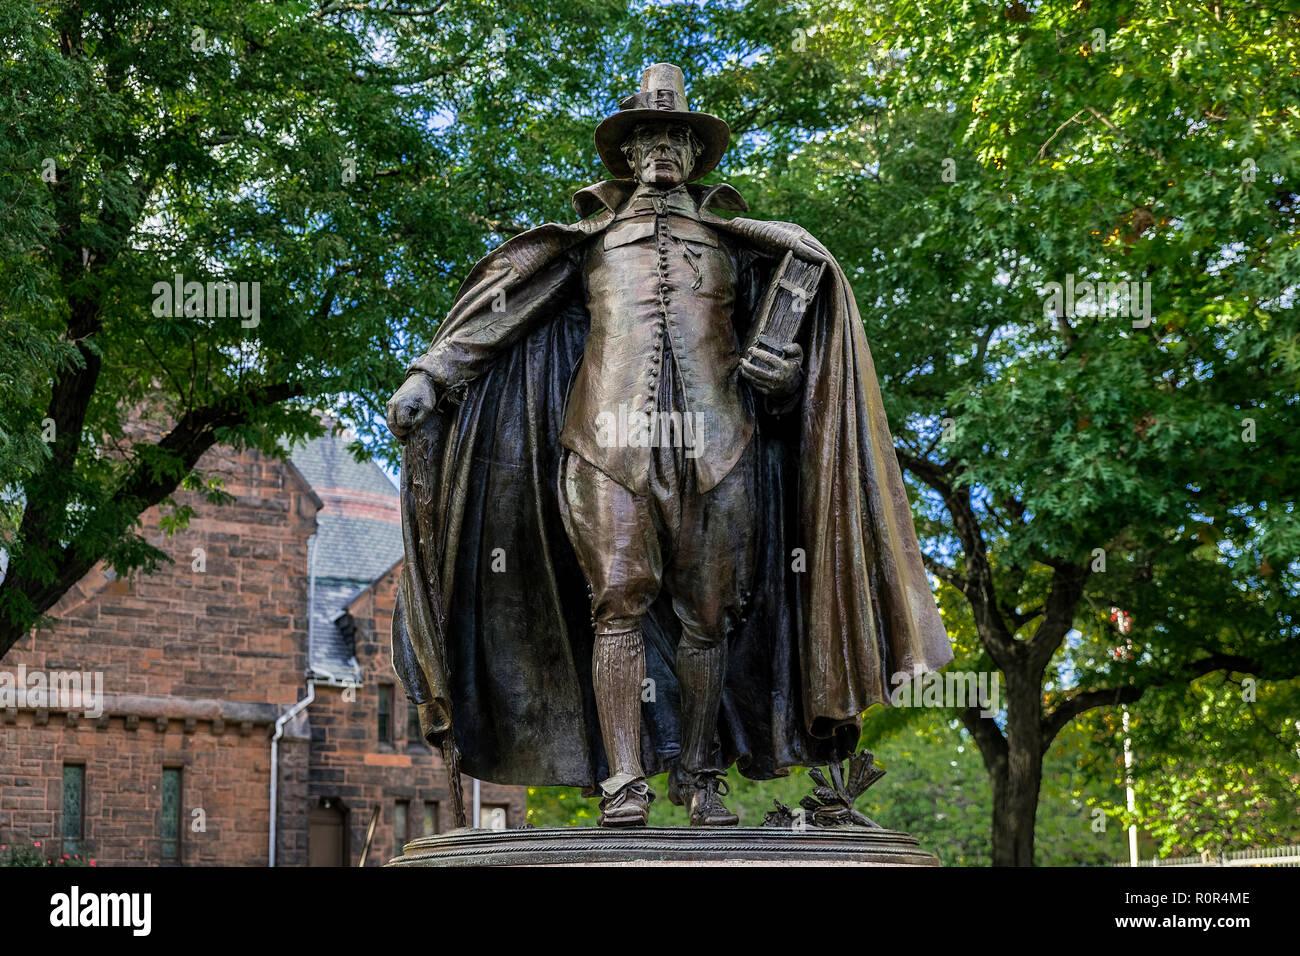 The Puritan Statue in Springfield Massachusetts, USA. - Stock Image